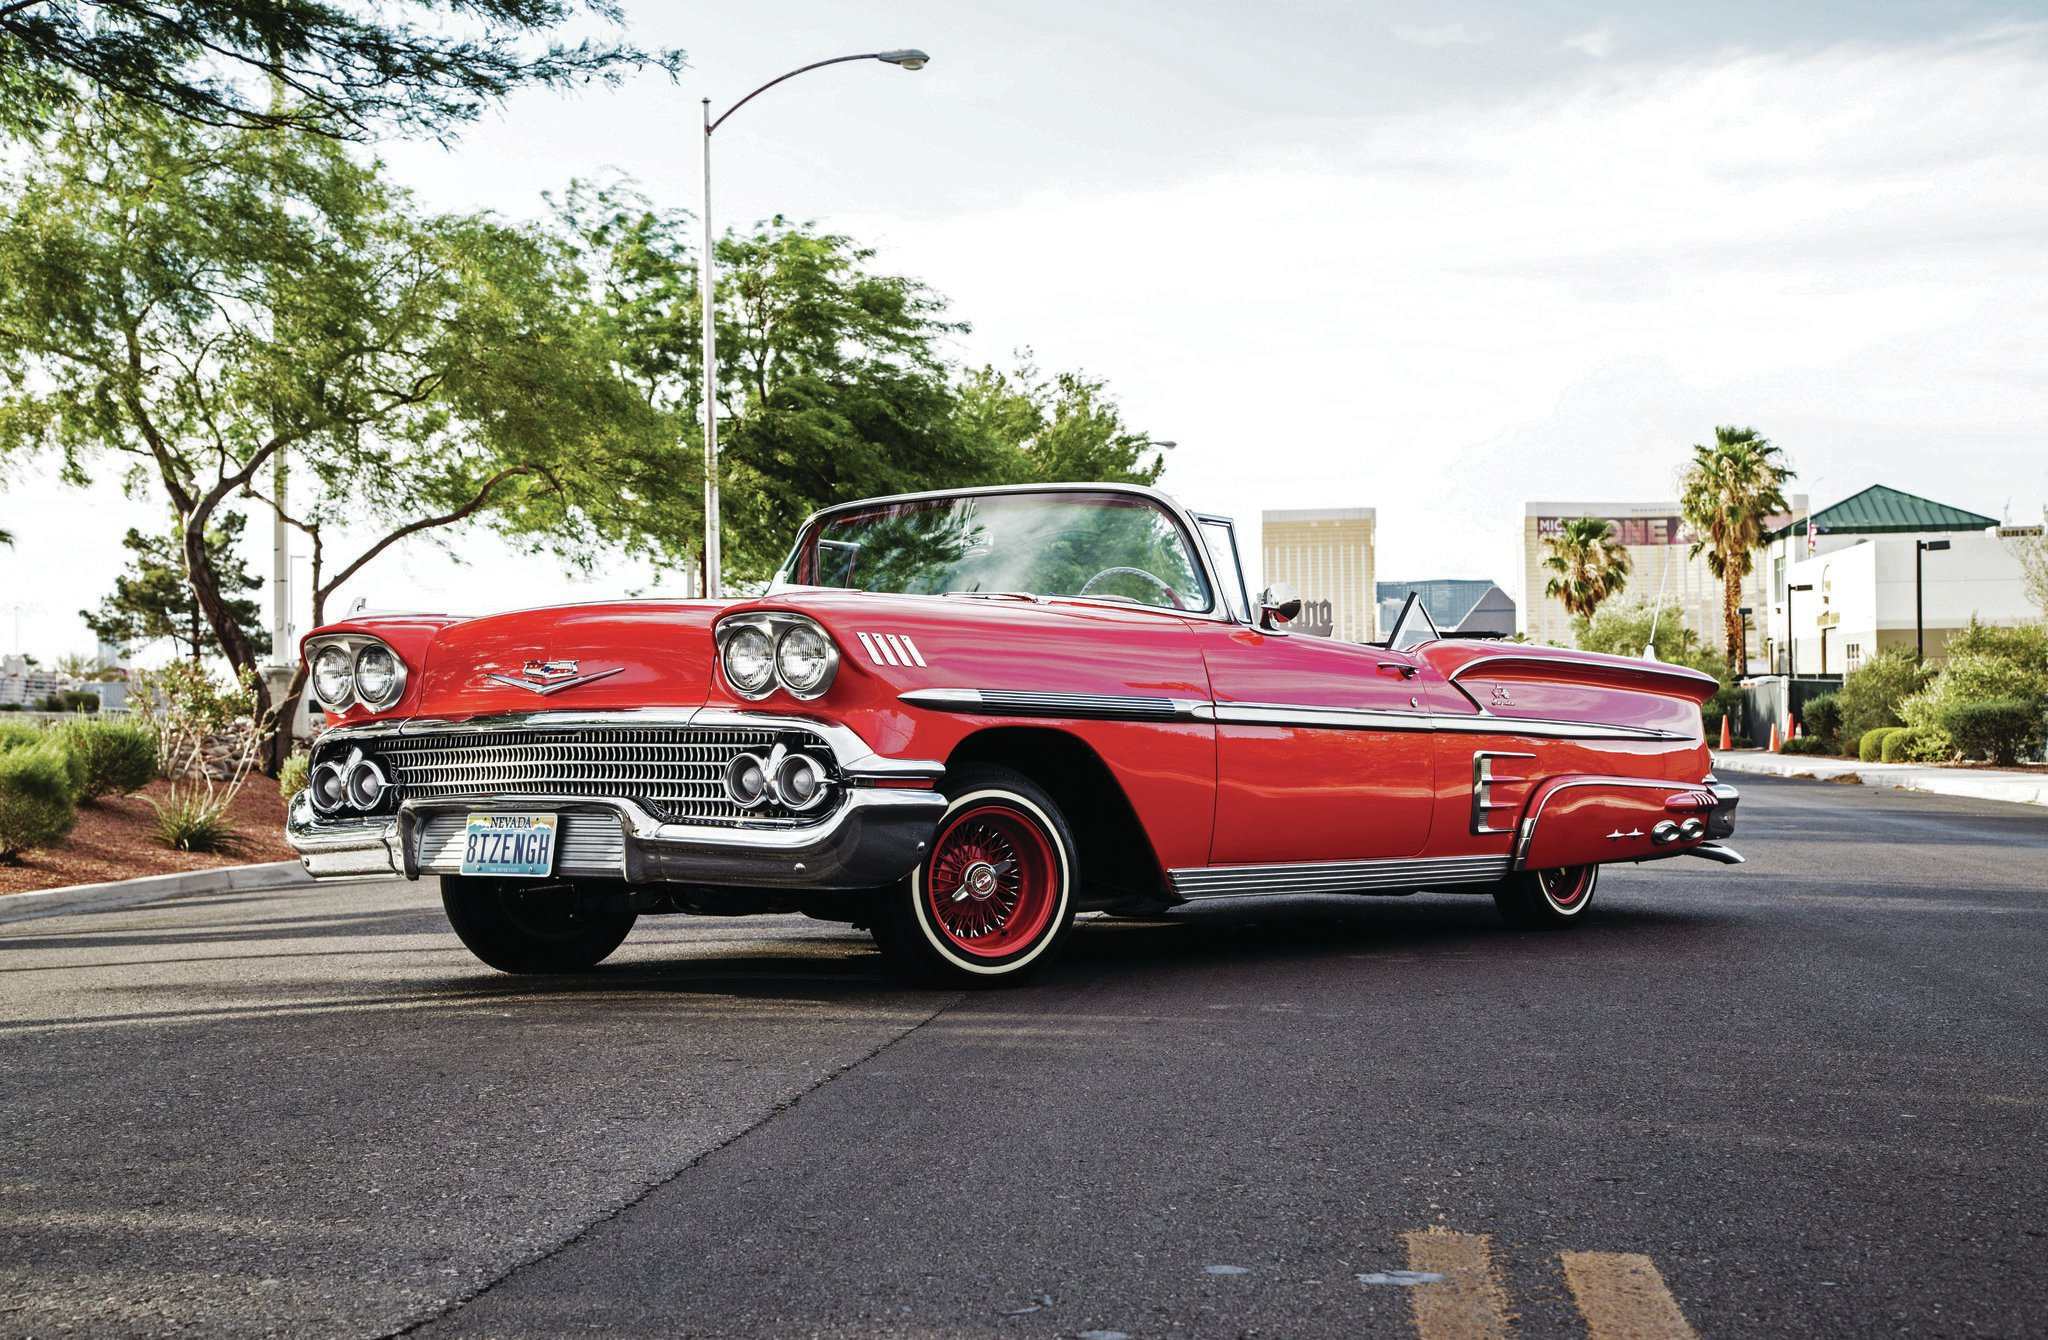 1958 Chevrolet Impala Convertible Vegas Vice